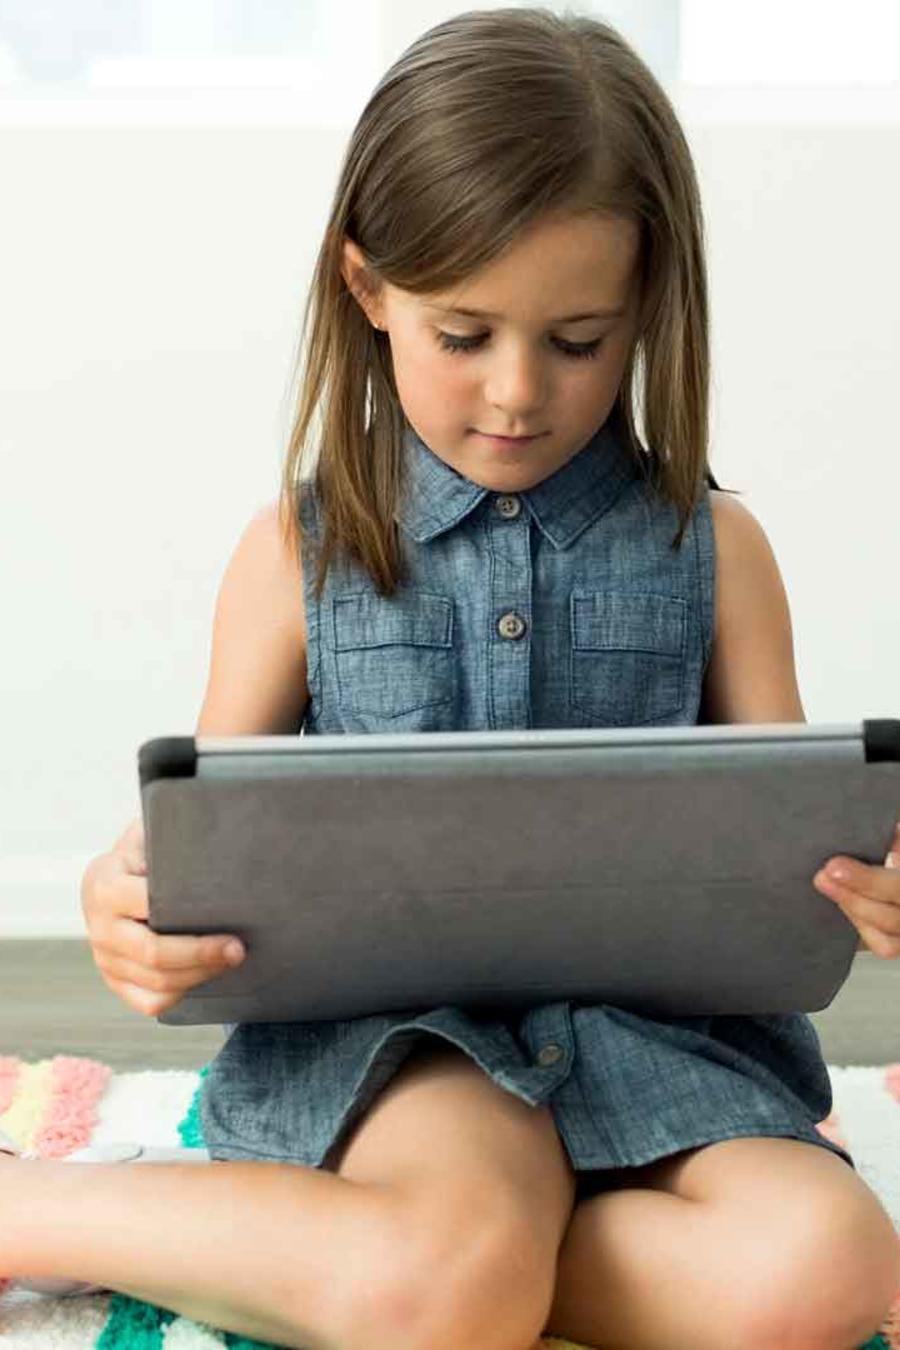 Niña en su iPad